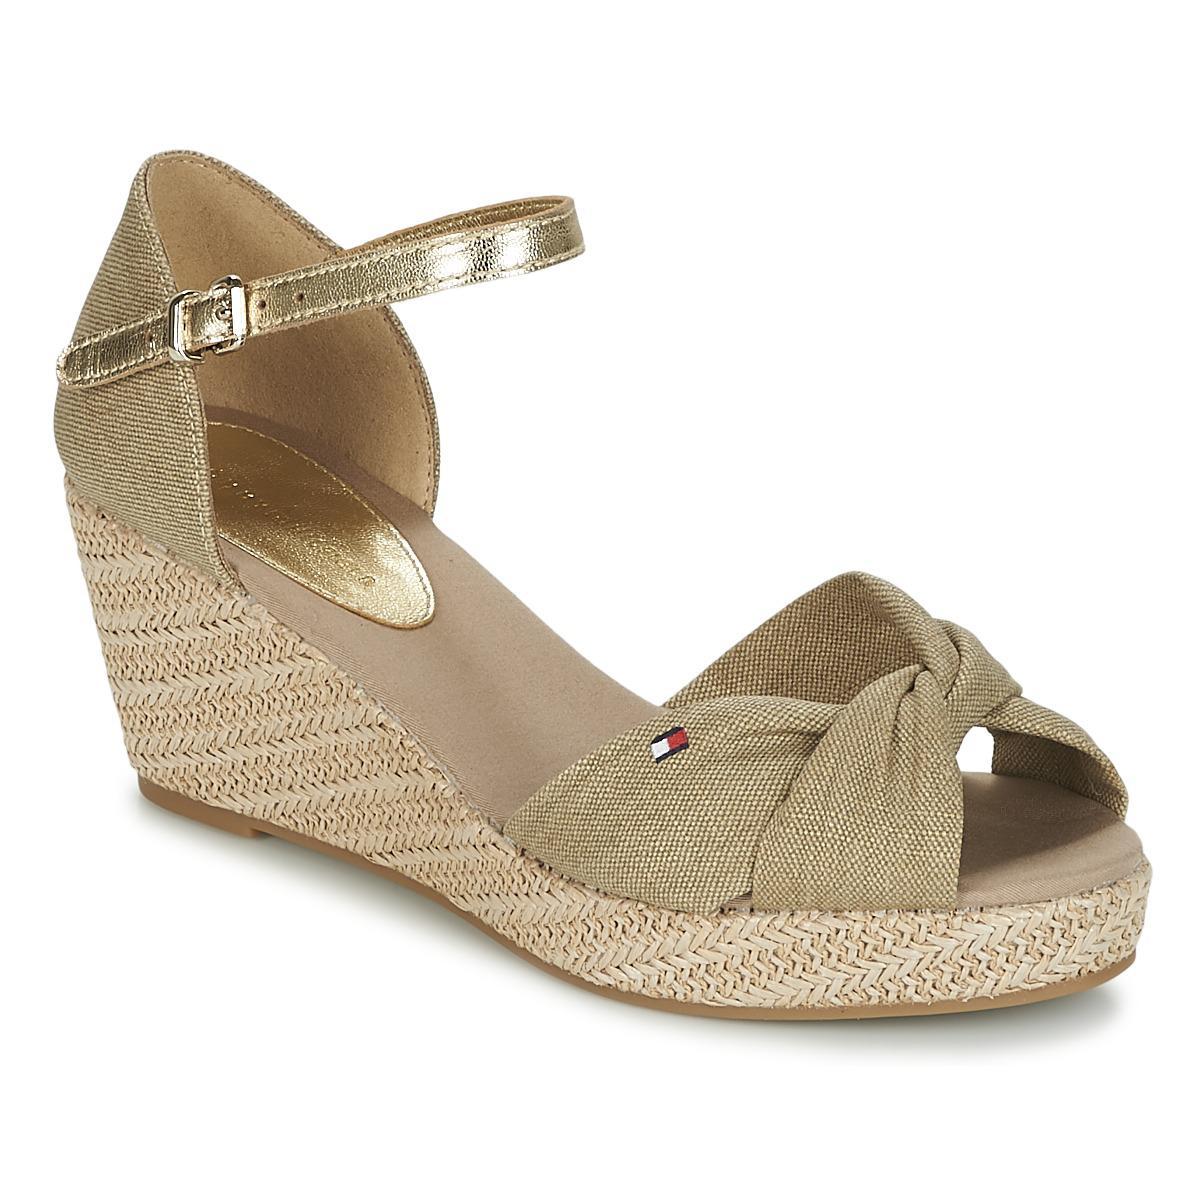 Tommy Hilfiger ICONIC ELBA METALLIC - Platform sandals - beige cgijL